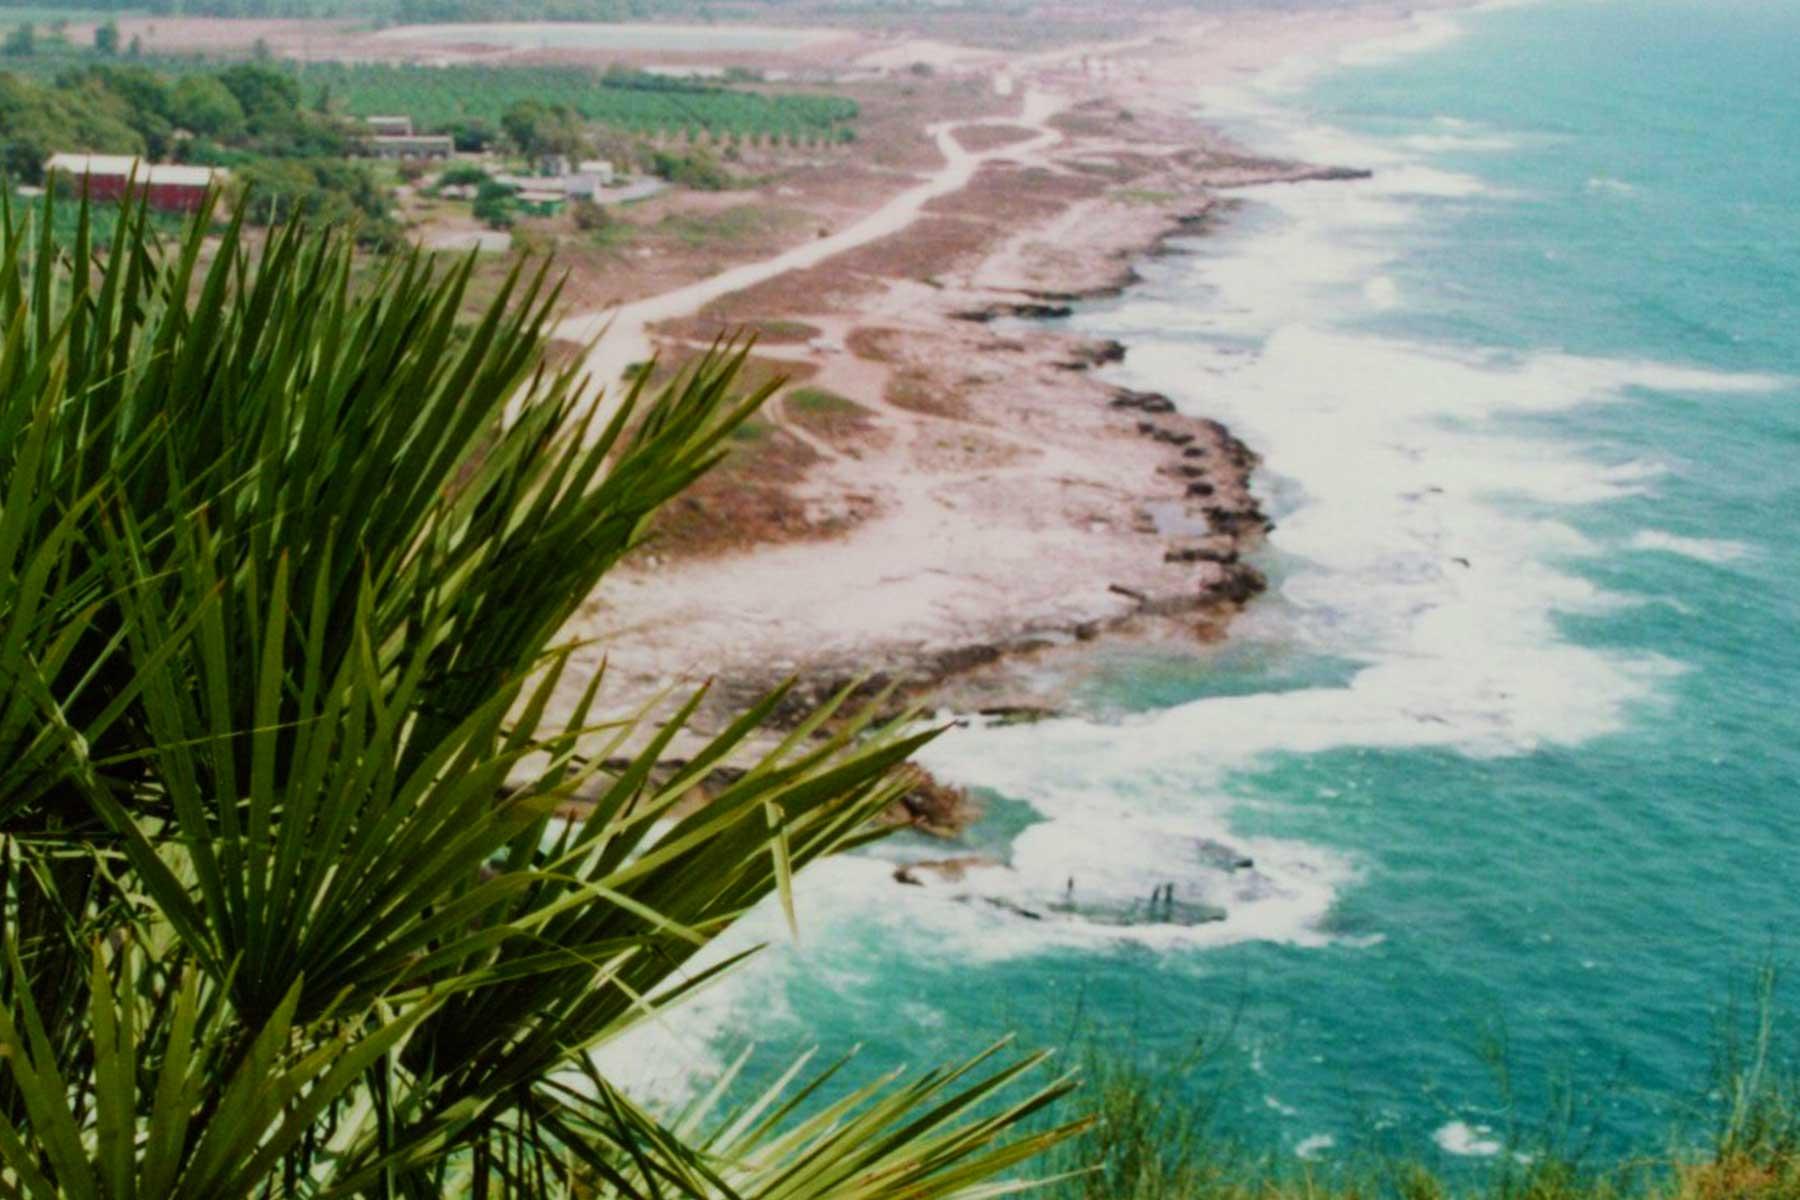 Israel/Lebanon Coast at Rosh Hanikra | Dr Steven A Martin | International Education Online | Steven Andrew Martin